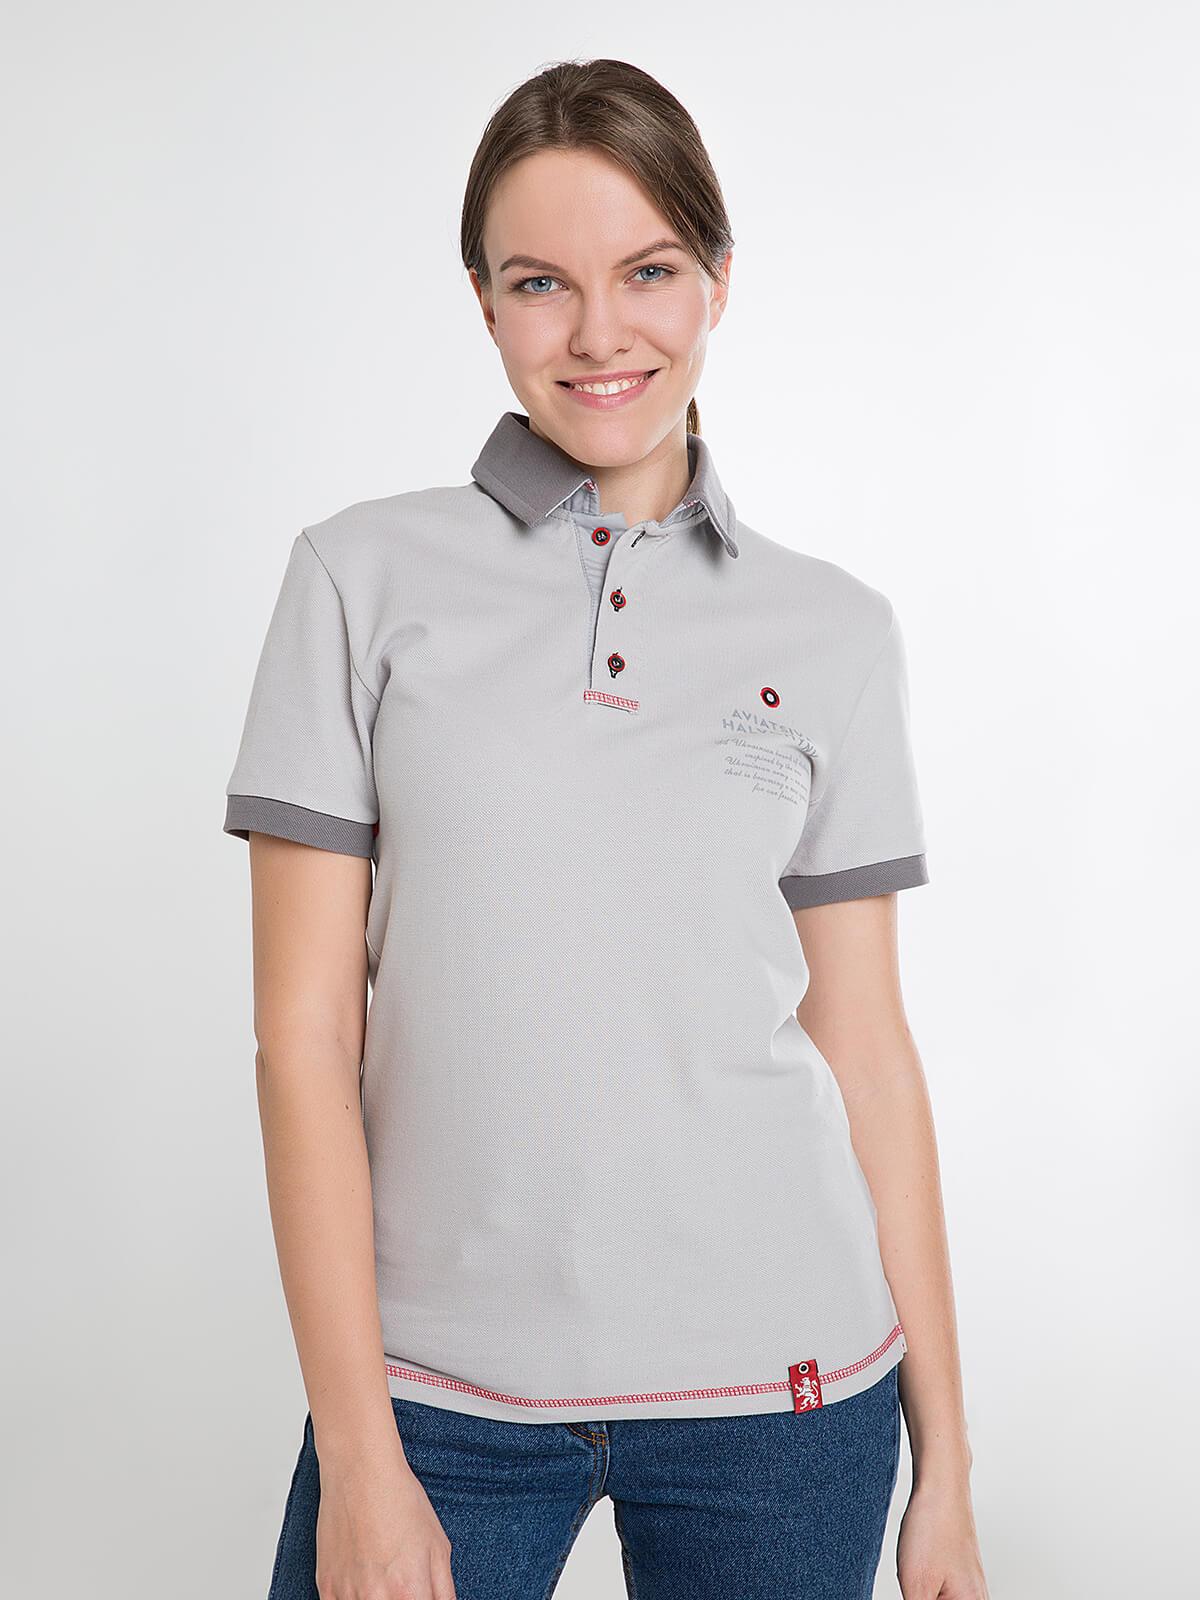 Women's Polo Shirt Wings. Color gray. Unisex polo (men's sizes).